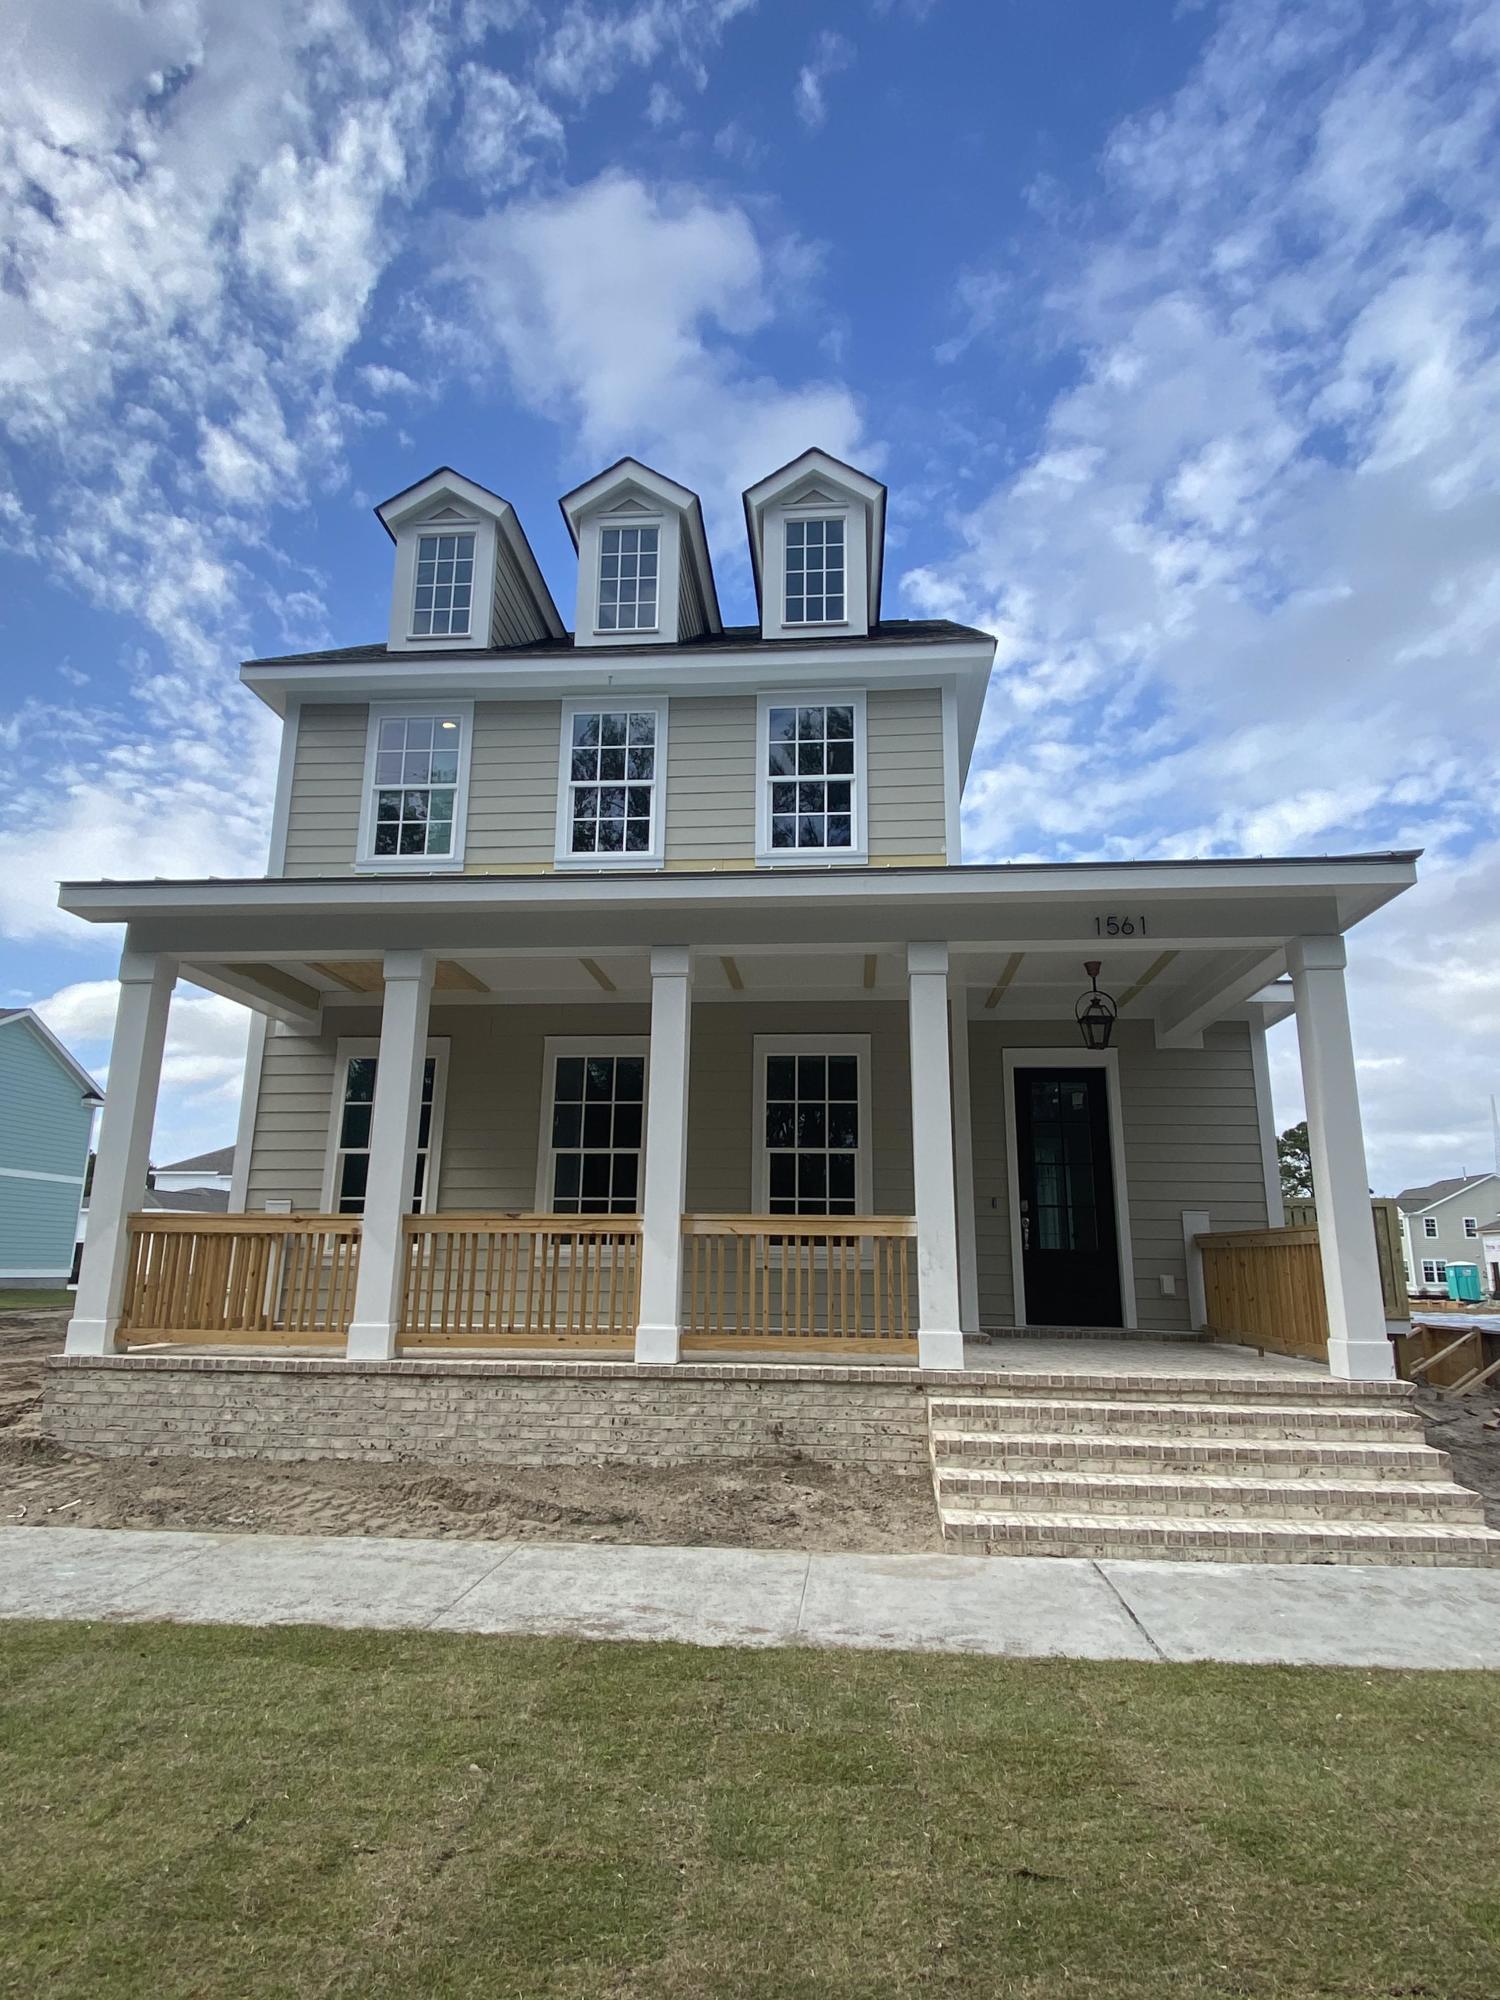 Midtown Homes For Sale - 1561 Kepley, Mount Pleasant, SC - 4